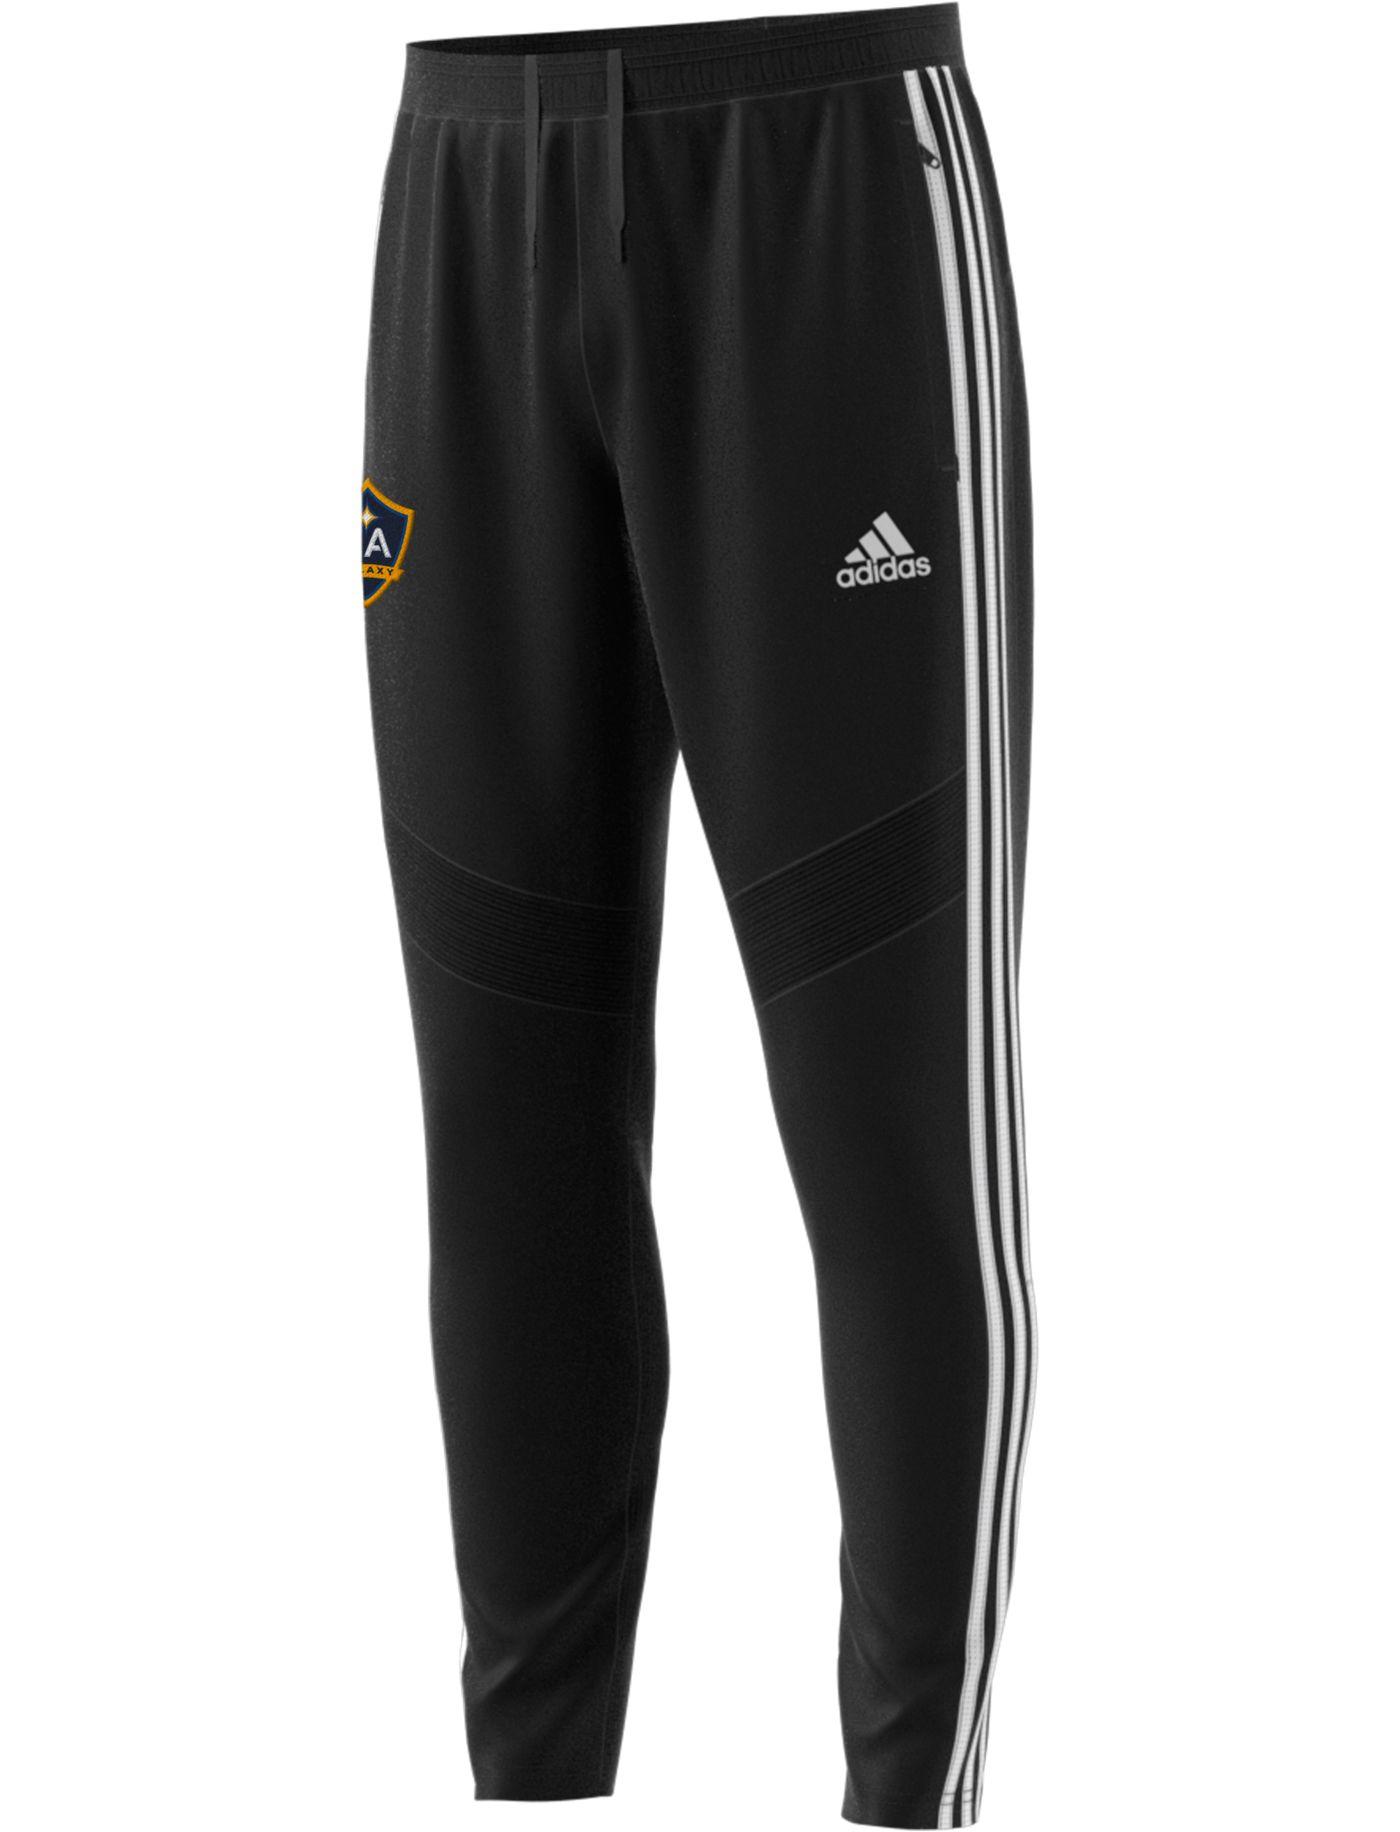 adidas Men's Los Angeles Galaxy Tiro Black Pants